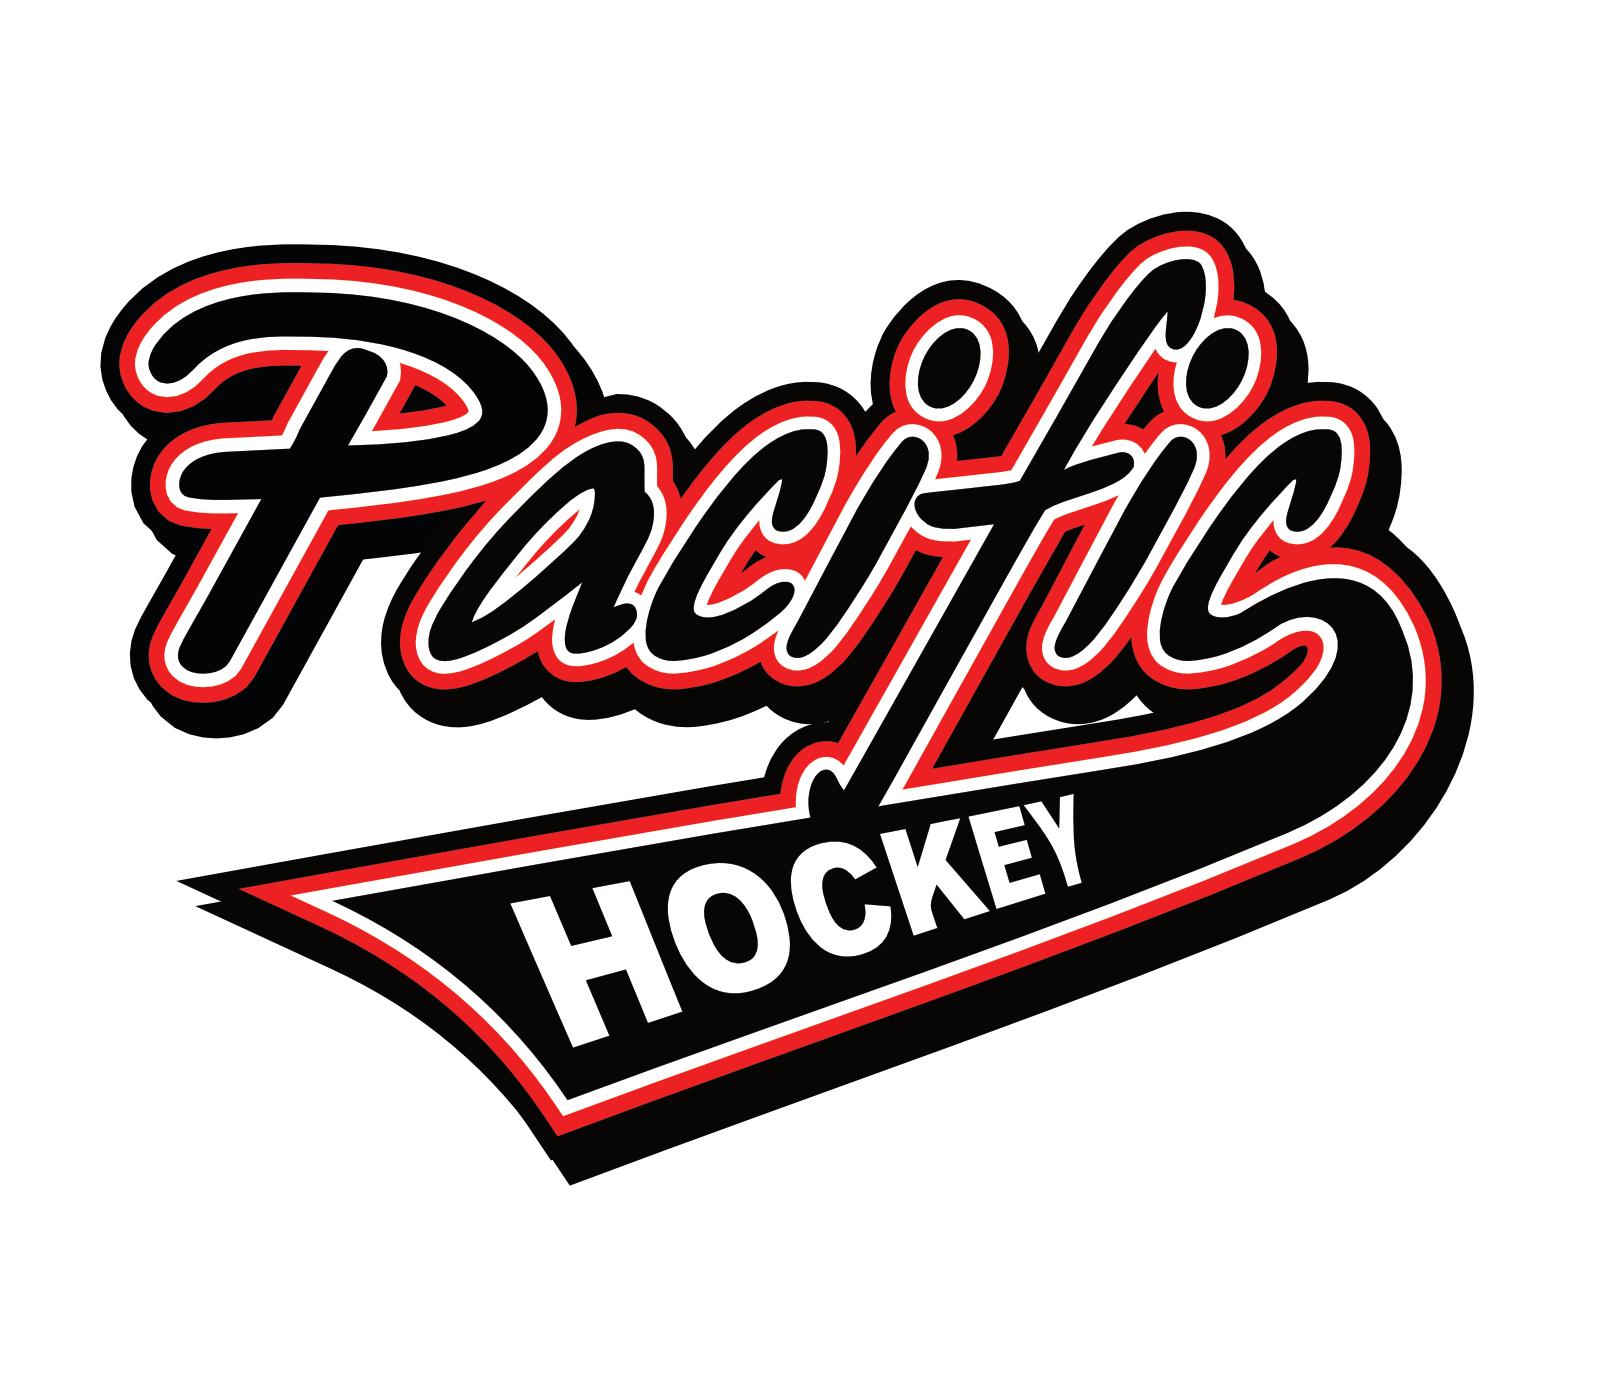 2009 Pacific Hockey